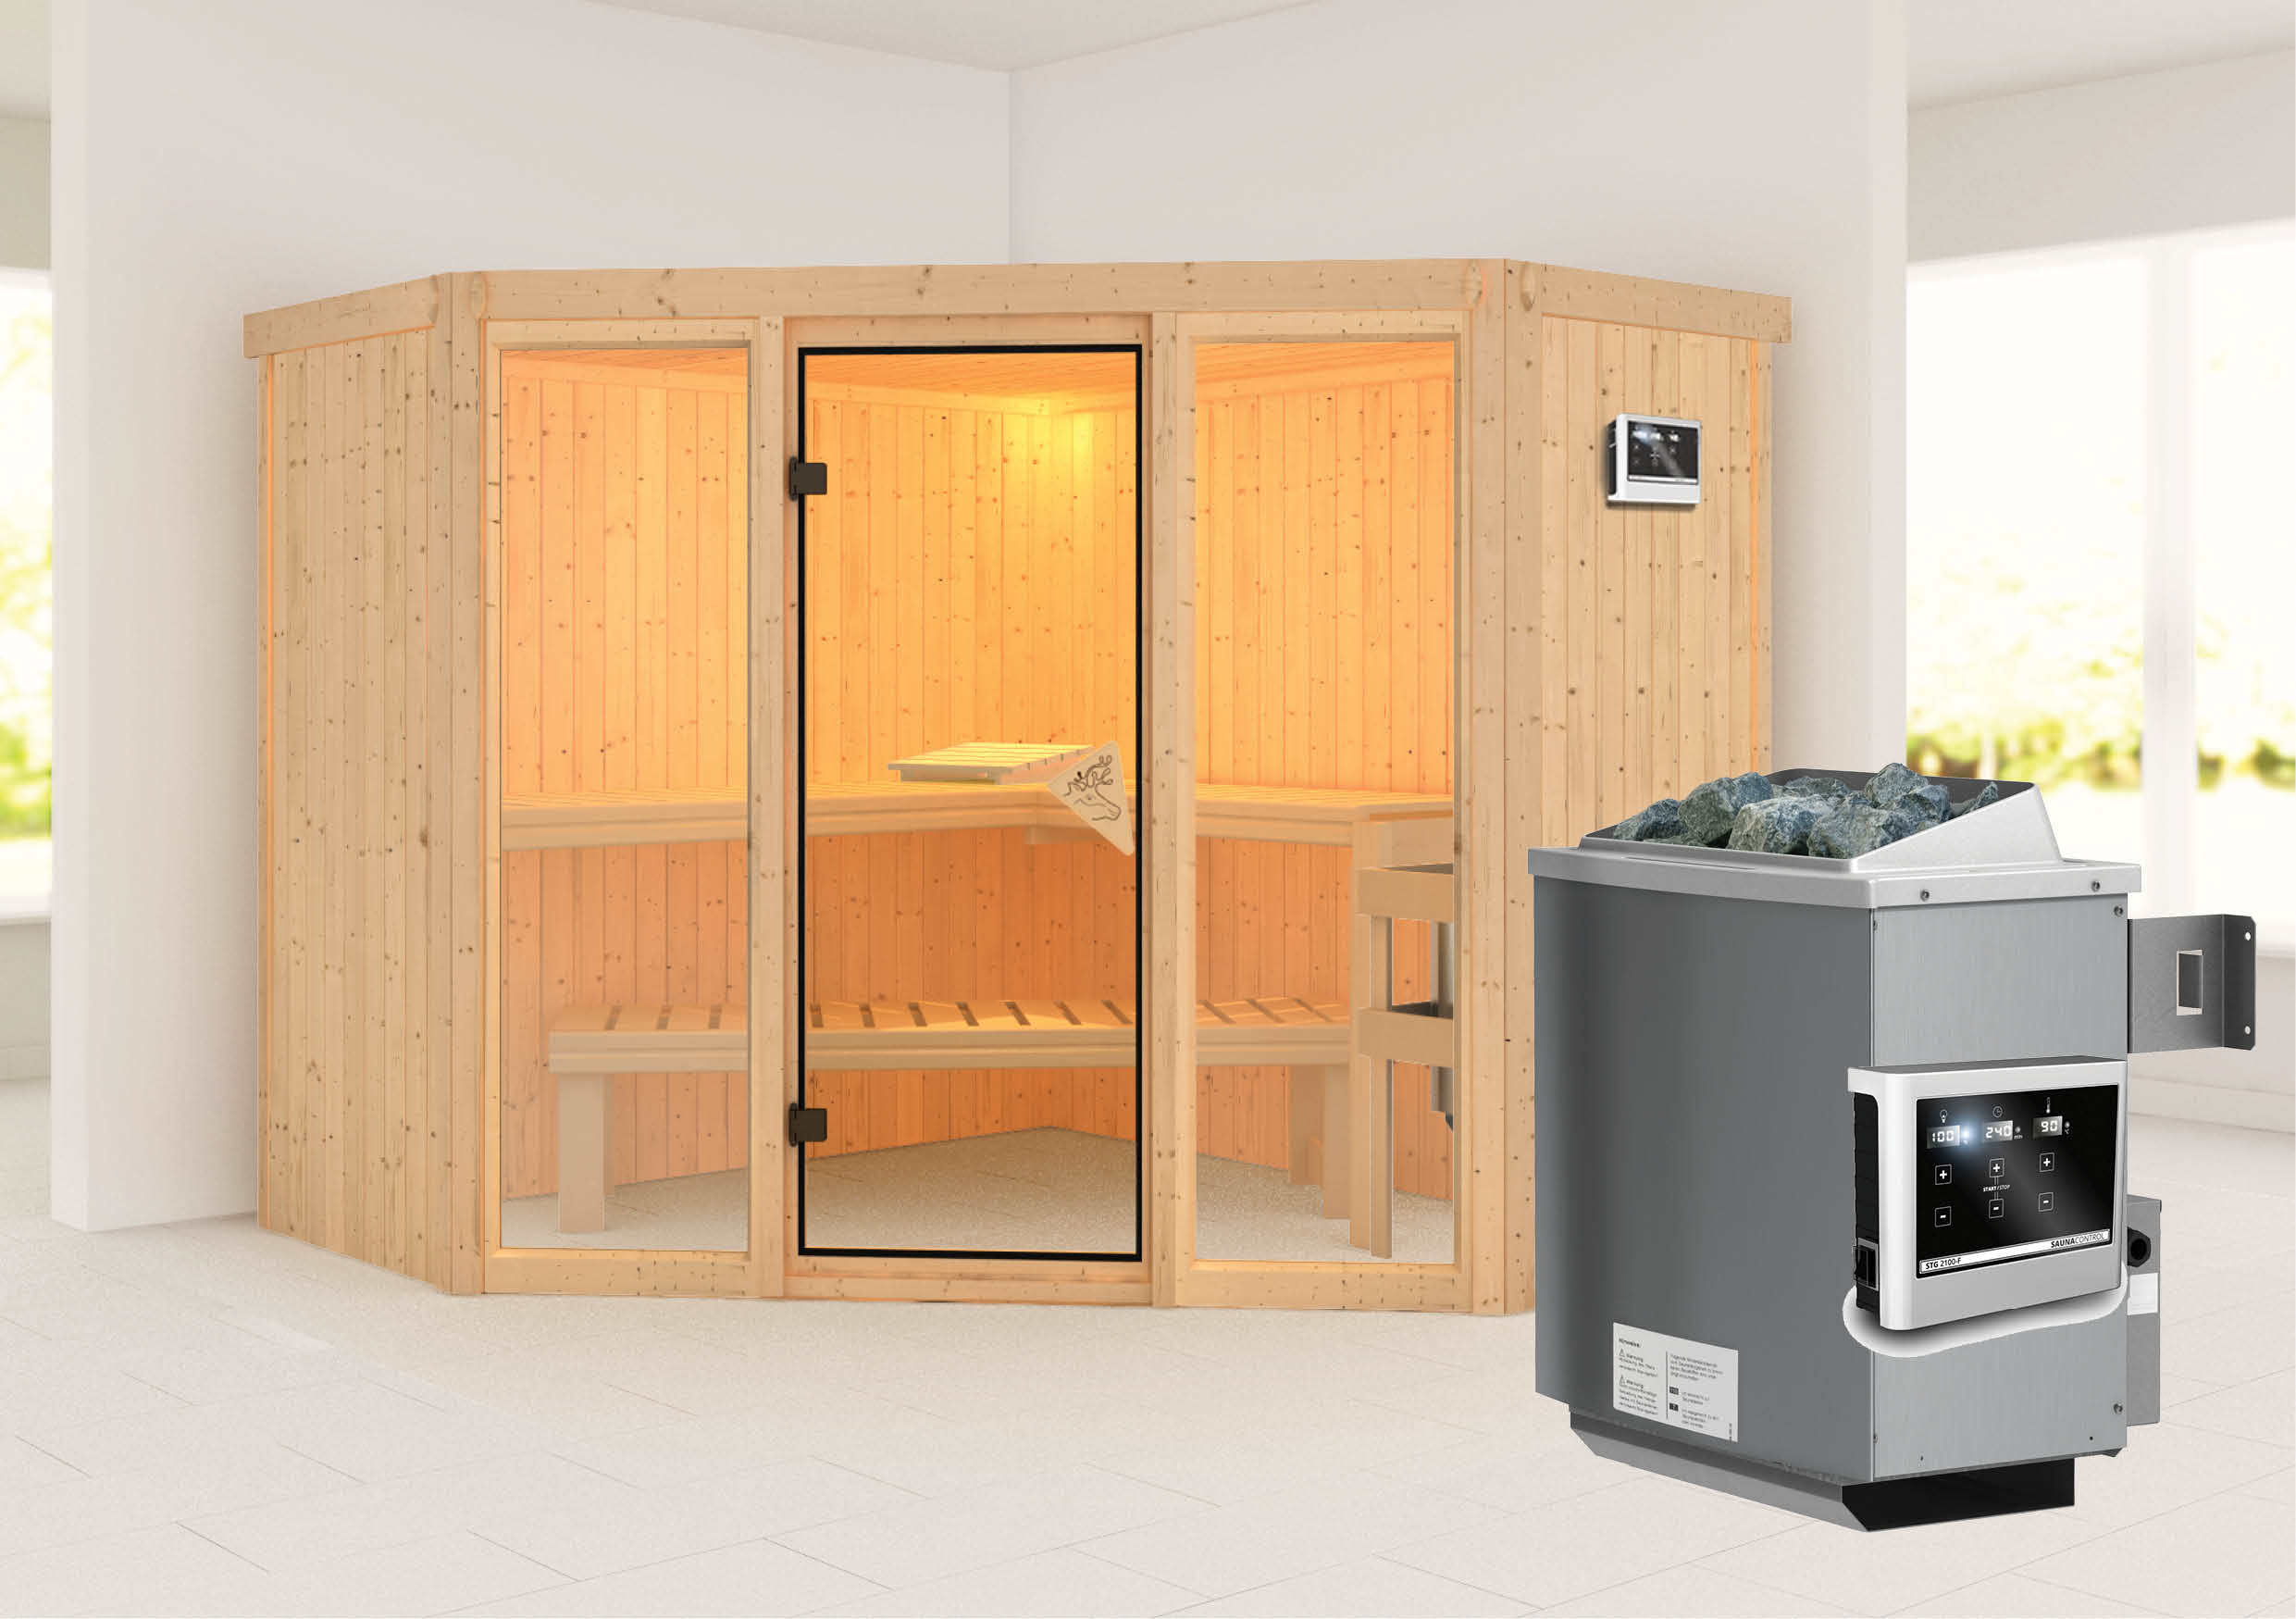 karibu elementsauna sauna flora 2 mit saunaofen 9kw ebay. Black Bedroom Furniture Sets. Home Design Ideas